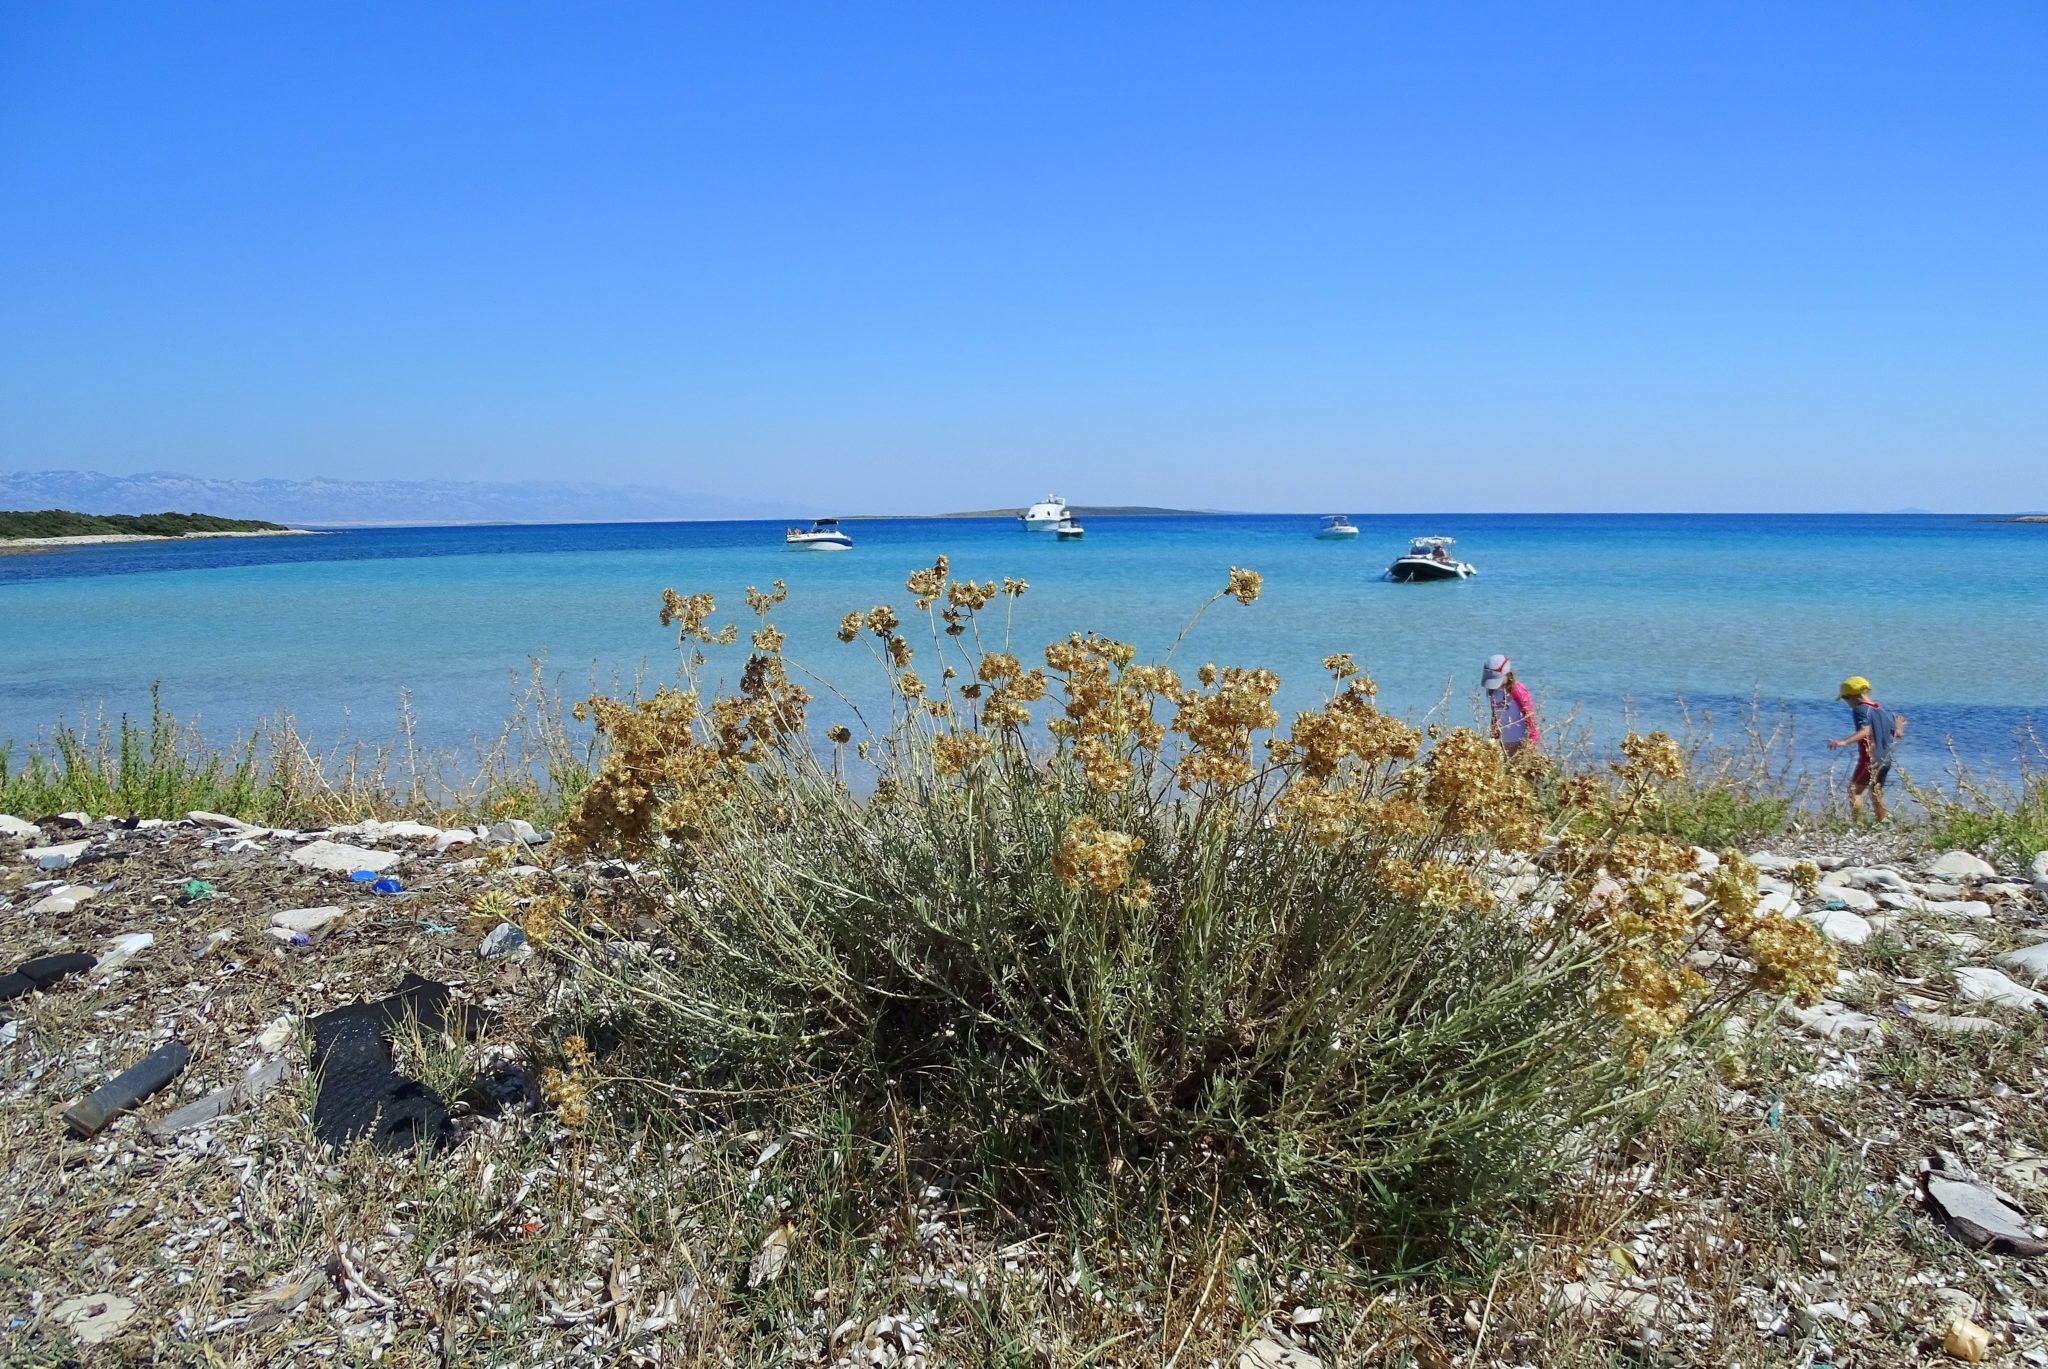 A wild beach on the Olib Island, Croatia